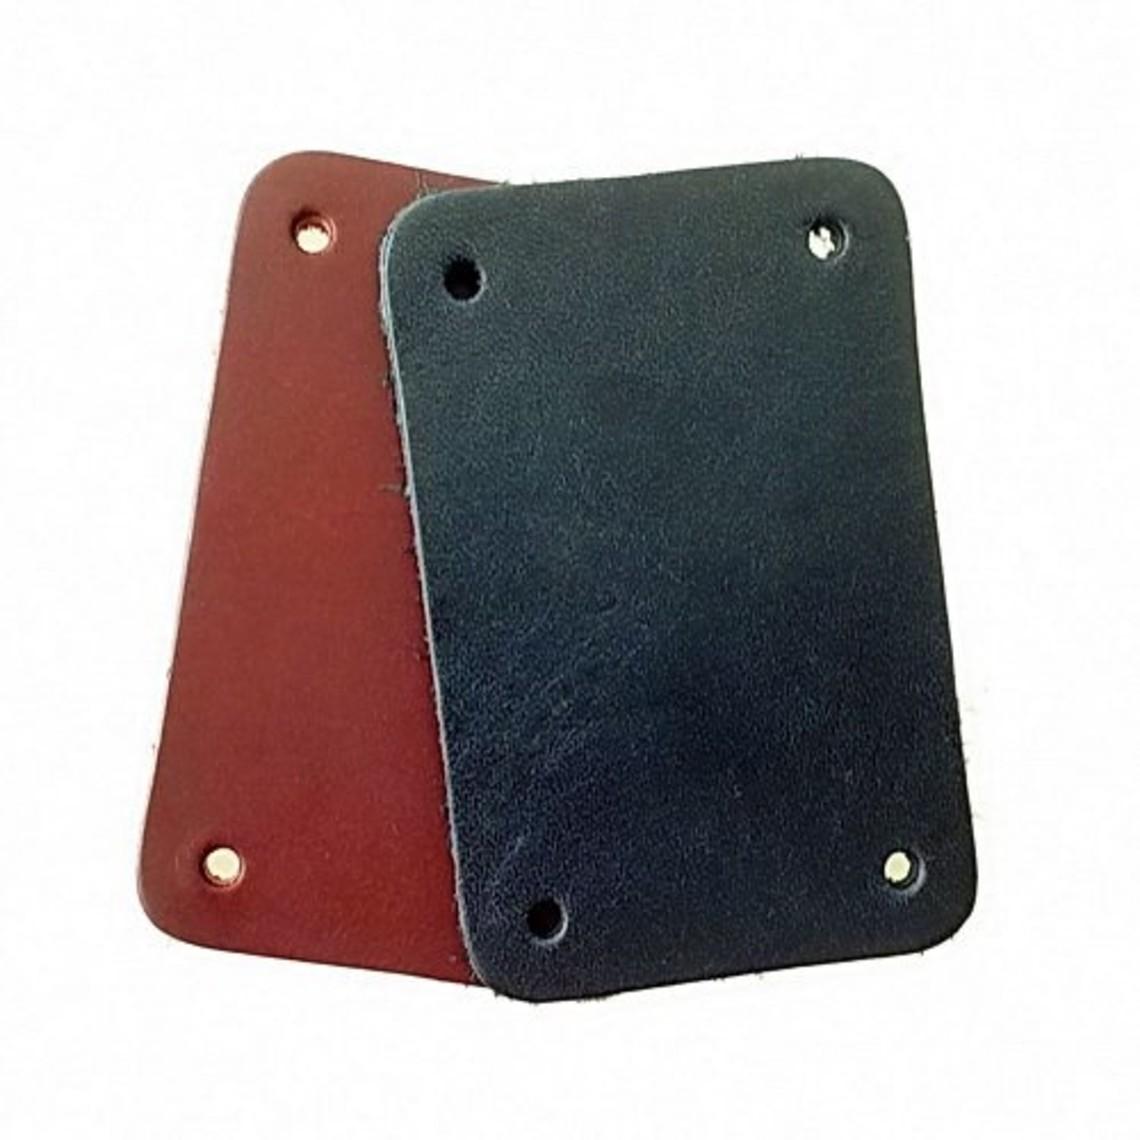 50x Leder-Rechteckstück für Schuppenpanzerung, schwarz